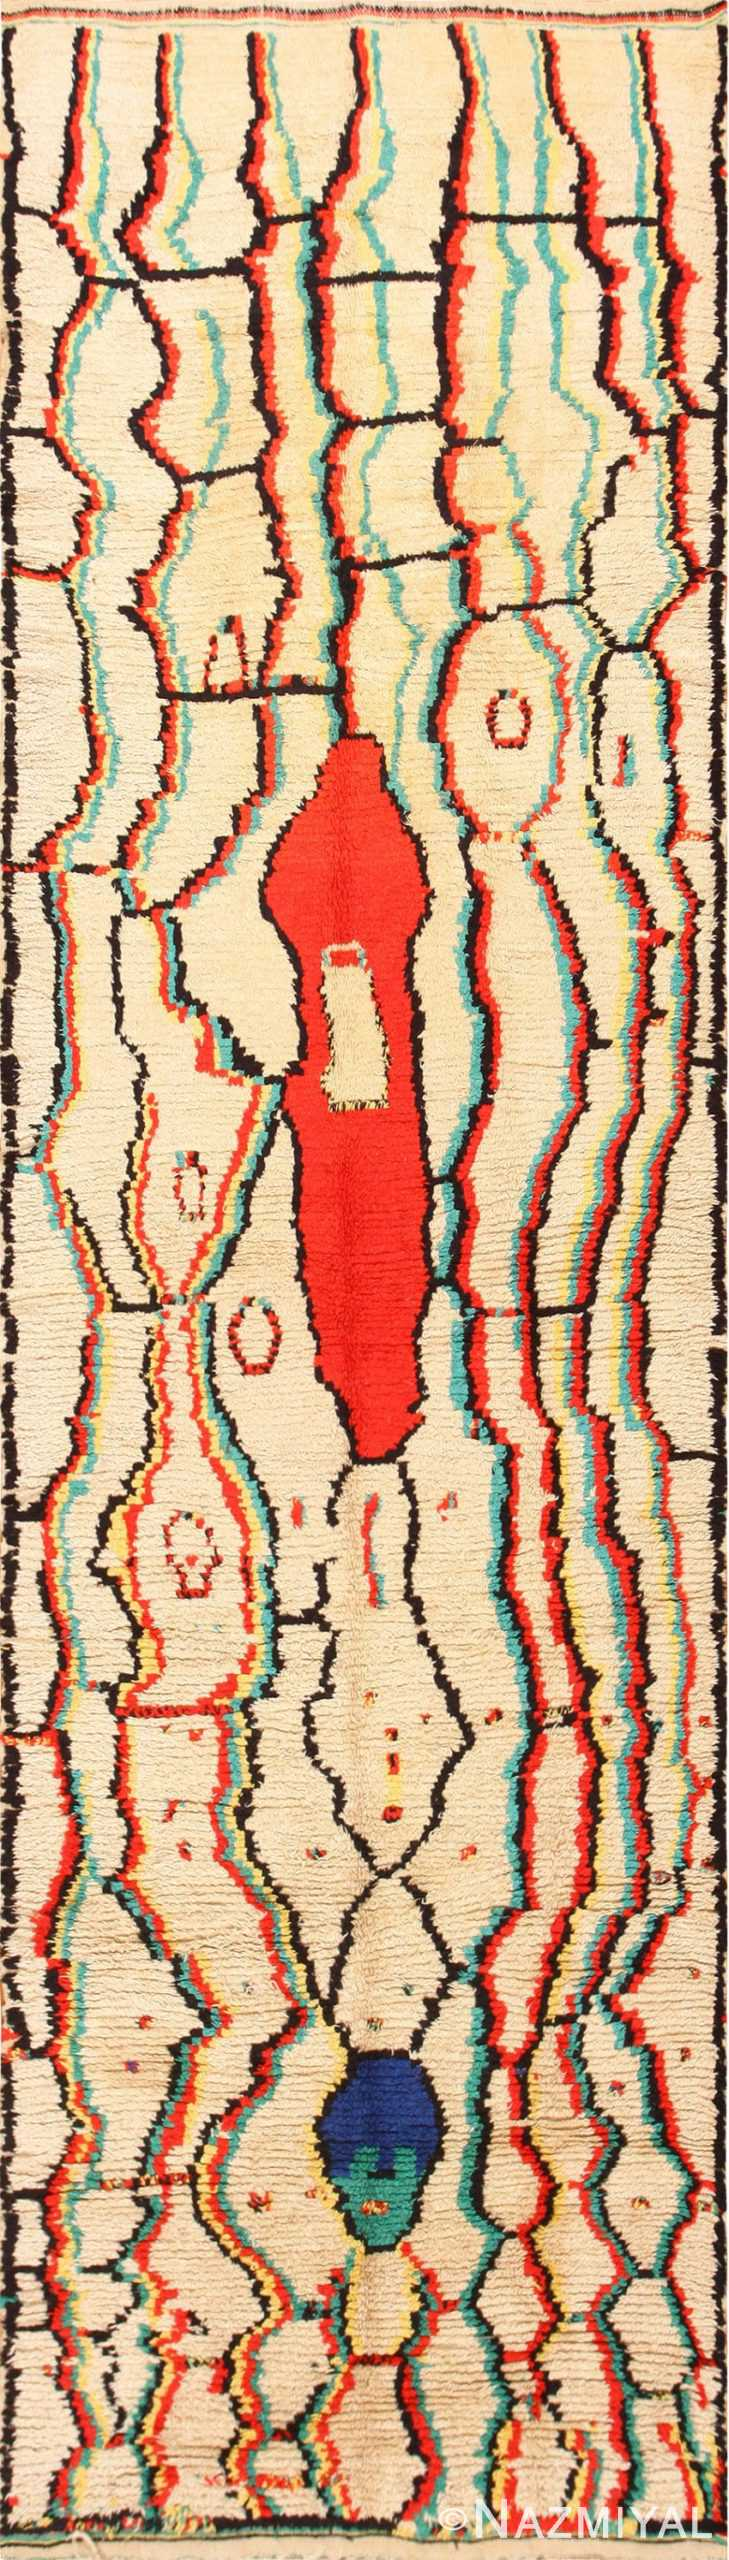 Gallery Size Vintage Berber Moroccan Rug 48948 Large Image